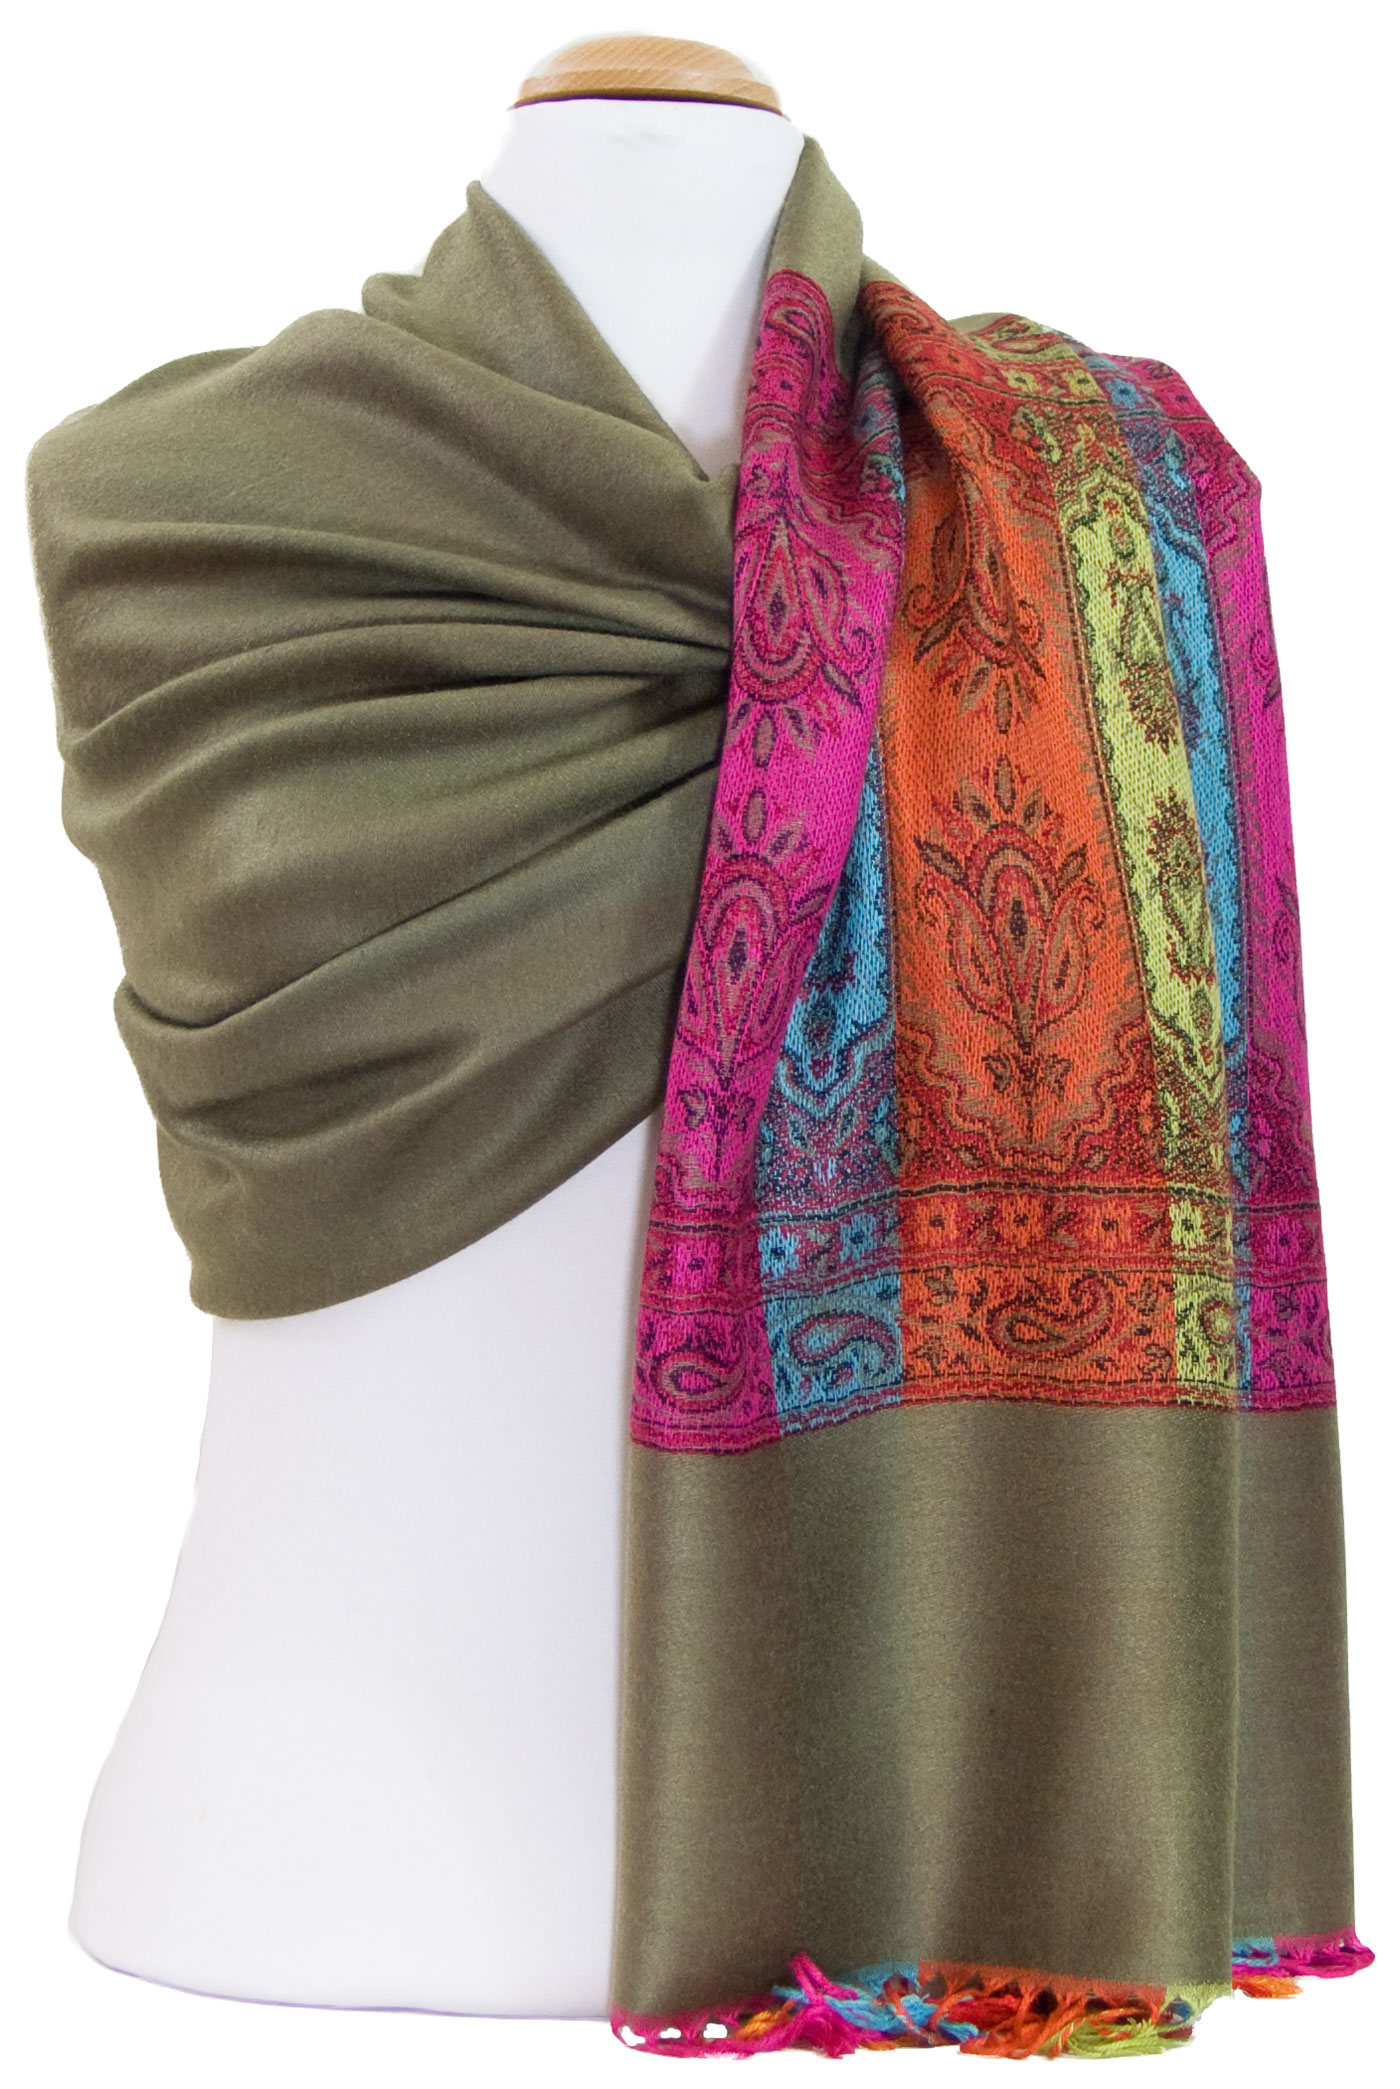 Etole pashmina kaki tissage multicolore